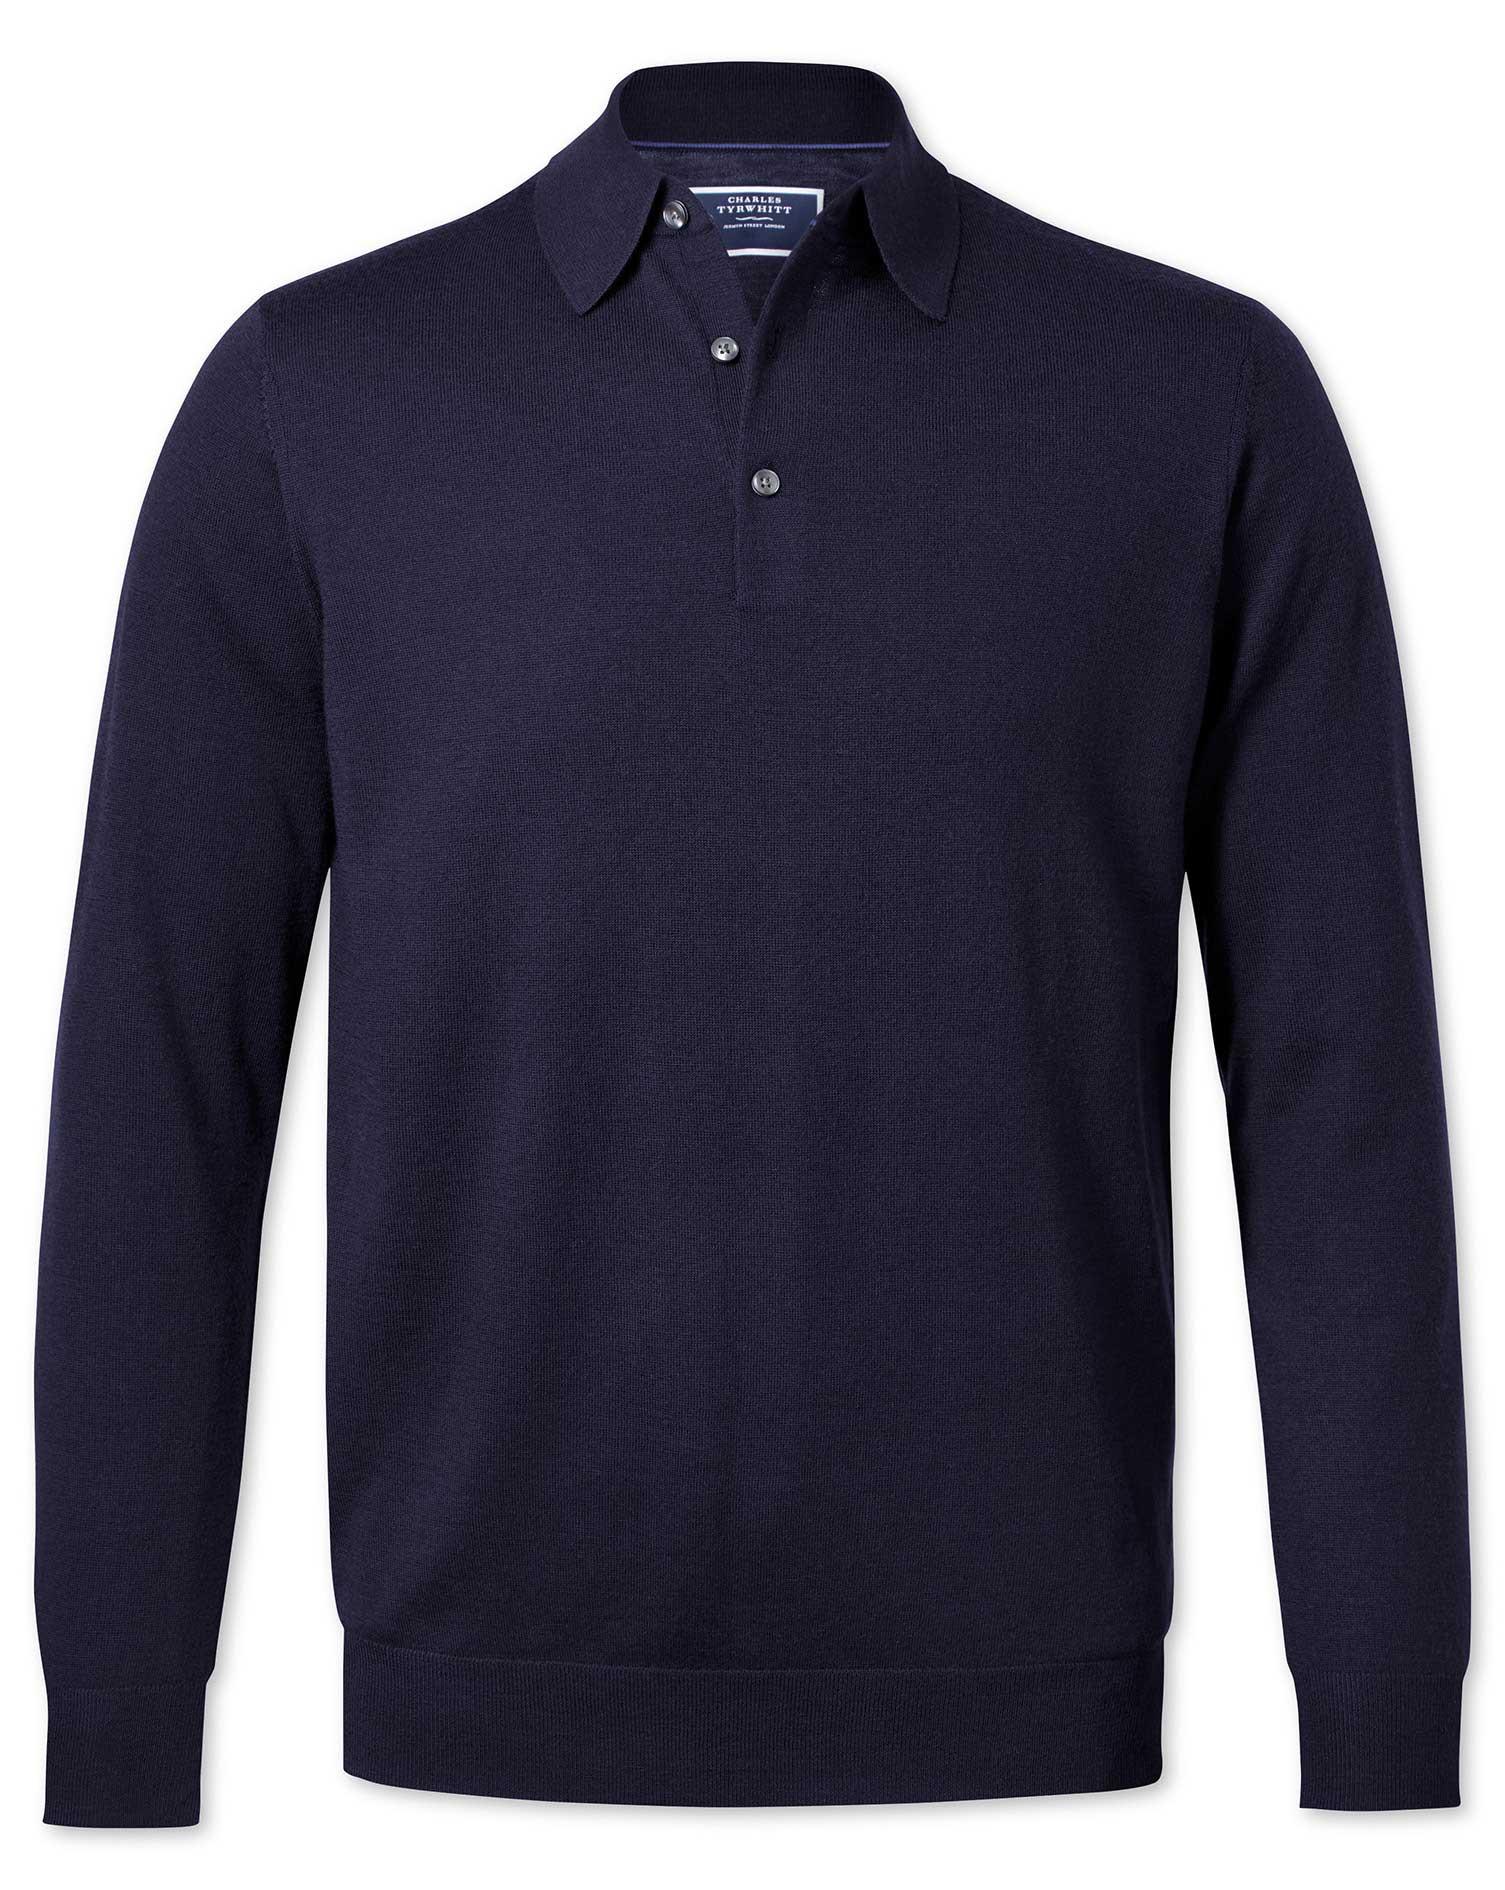 Navy Wool Polo Collar Merino Wool Jumper Size XS by Charles Tyrwhitt